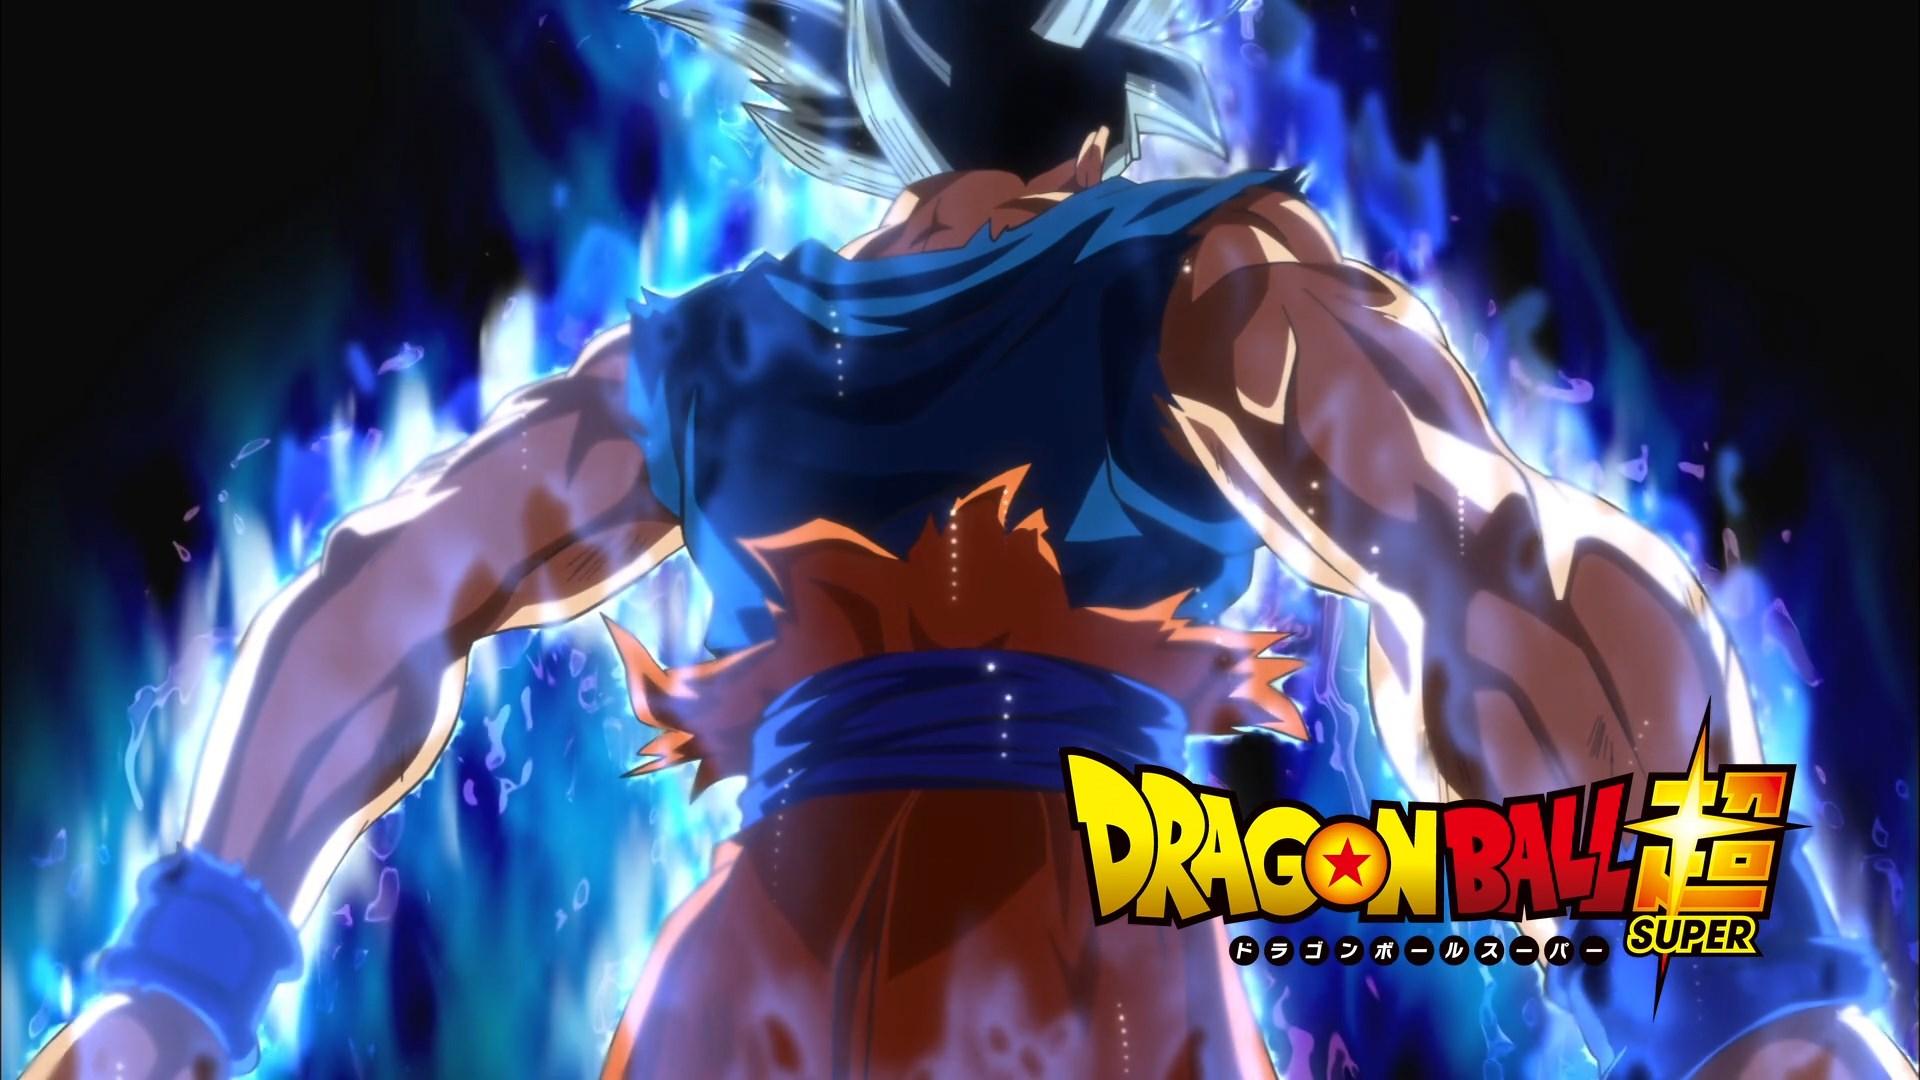 [HorribleSubs] Dragon Ball Super - 121 [1080p].mkv_snapshot_11.59